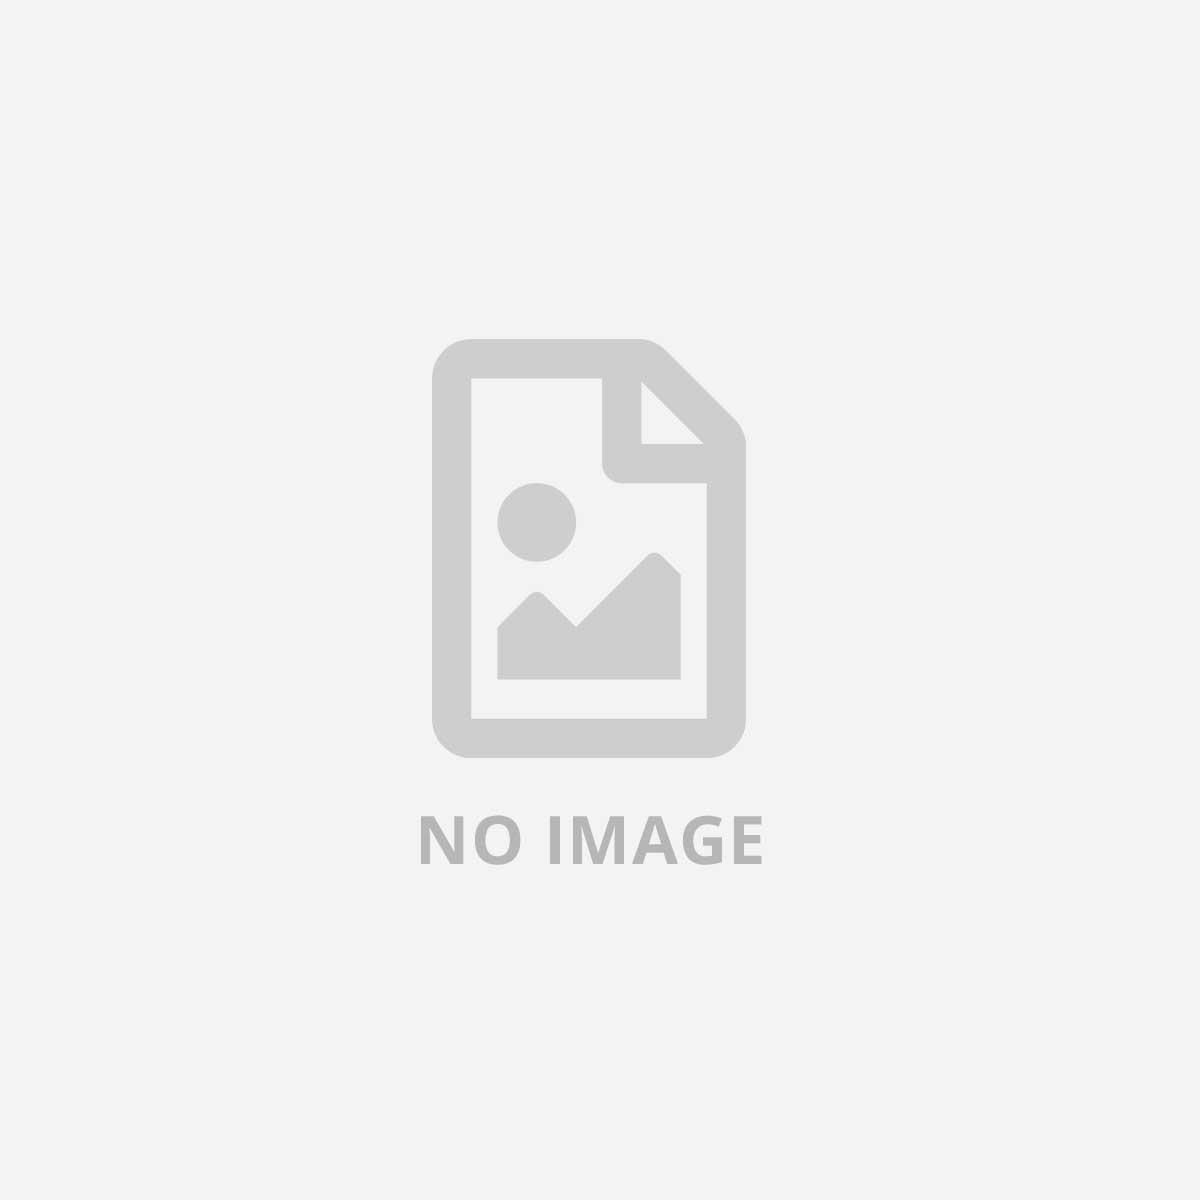 AOPEN ETILE-X 15M N2930